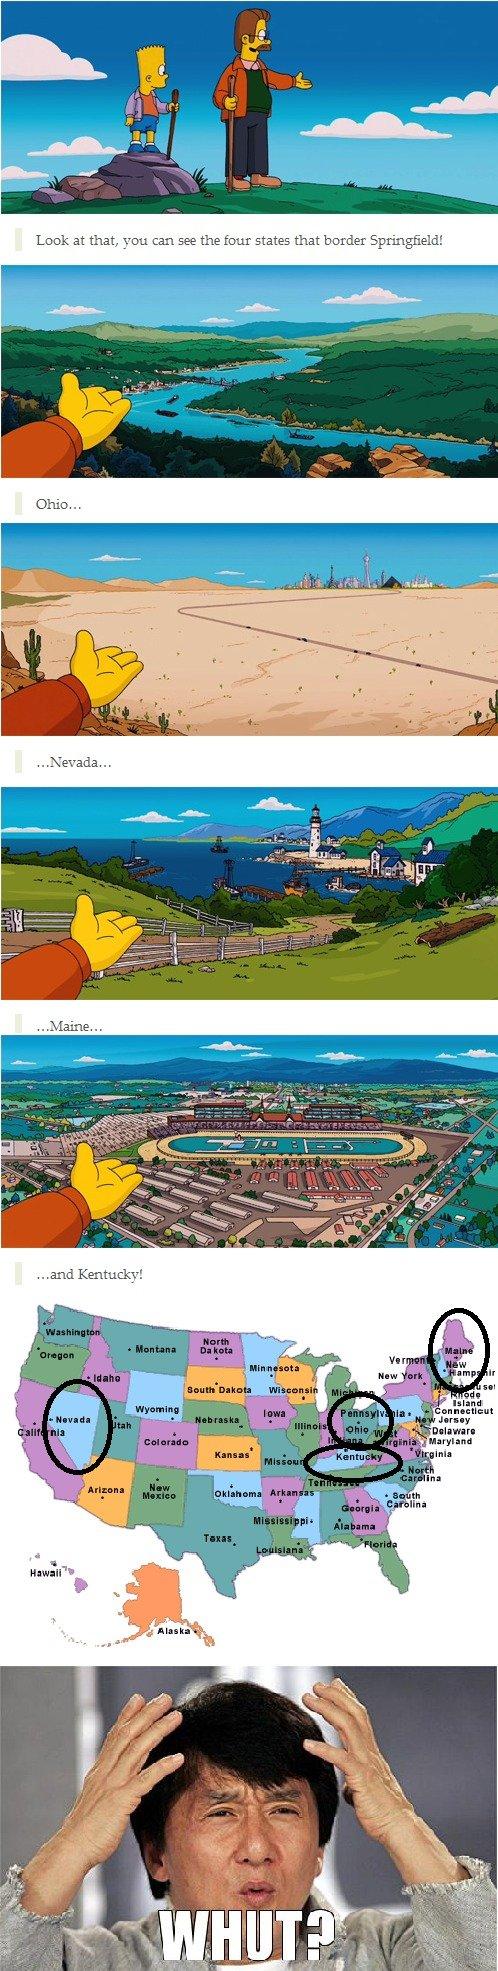 Simpsons Movie. . EHW: -truer!. it's a cartoon, who says it should make sense?